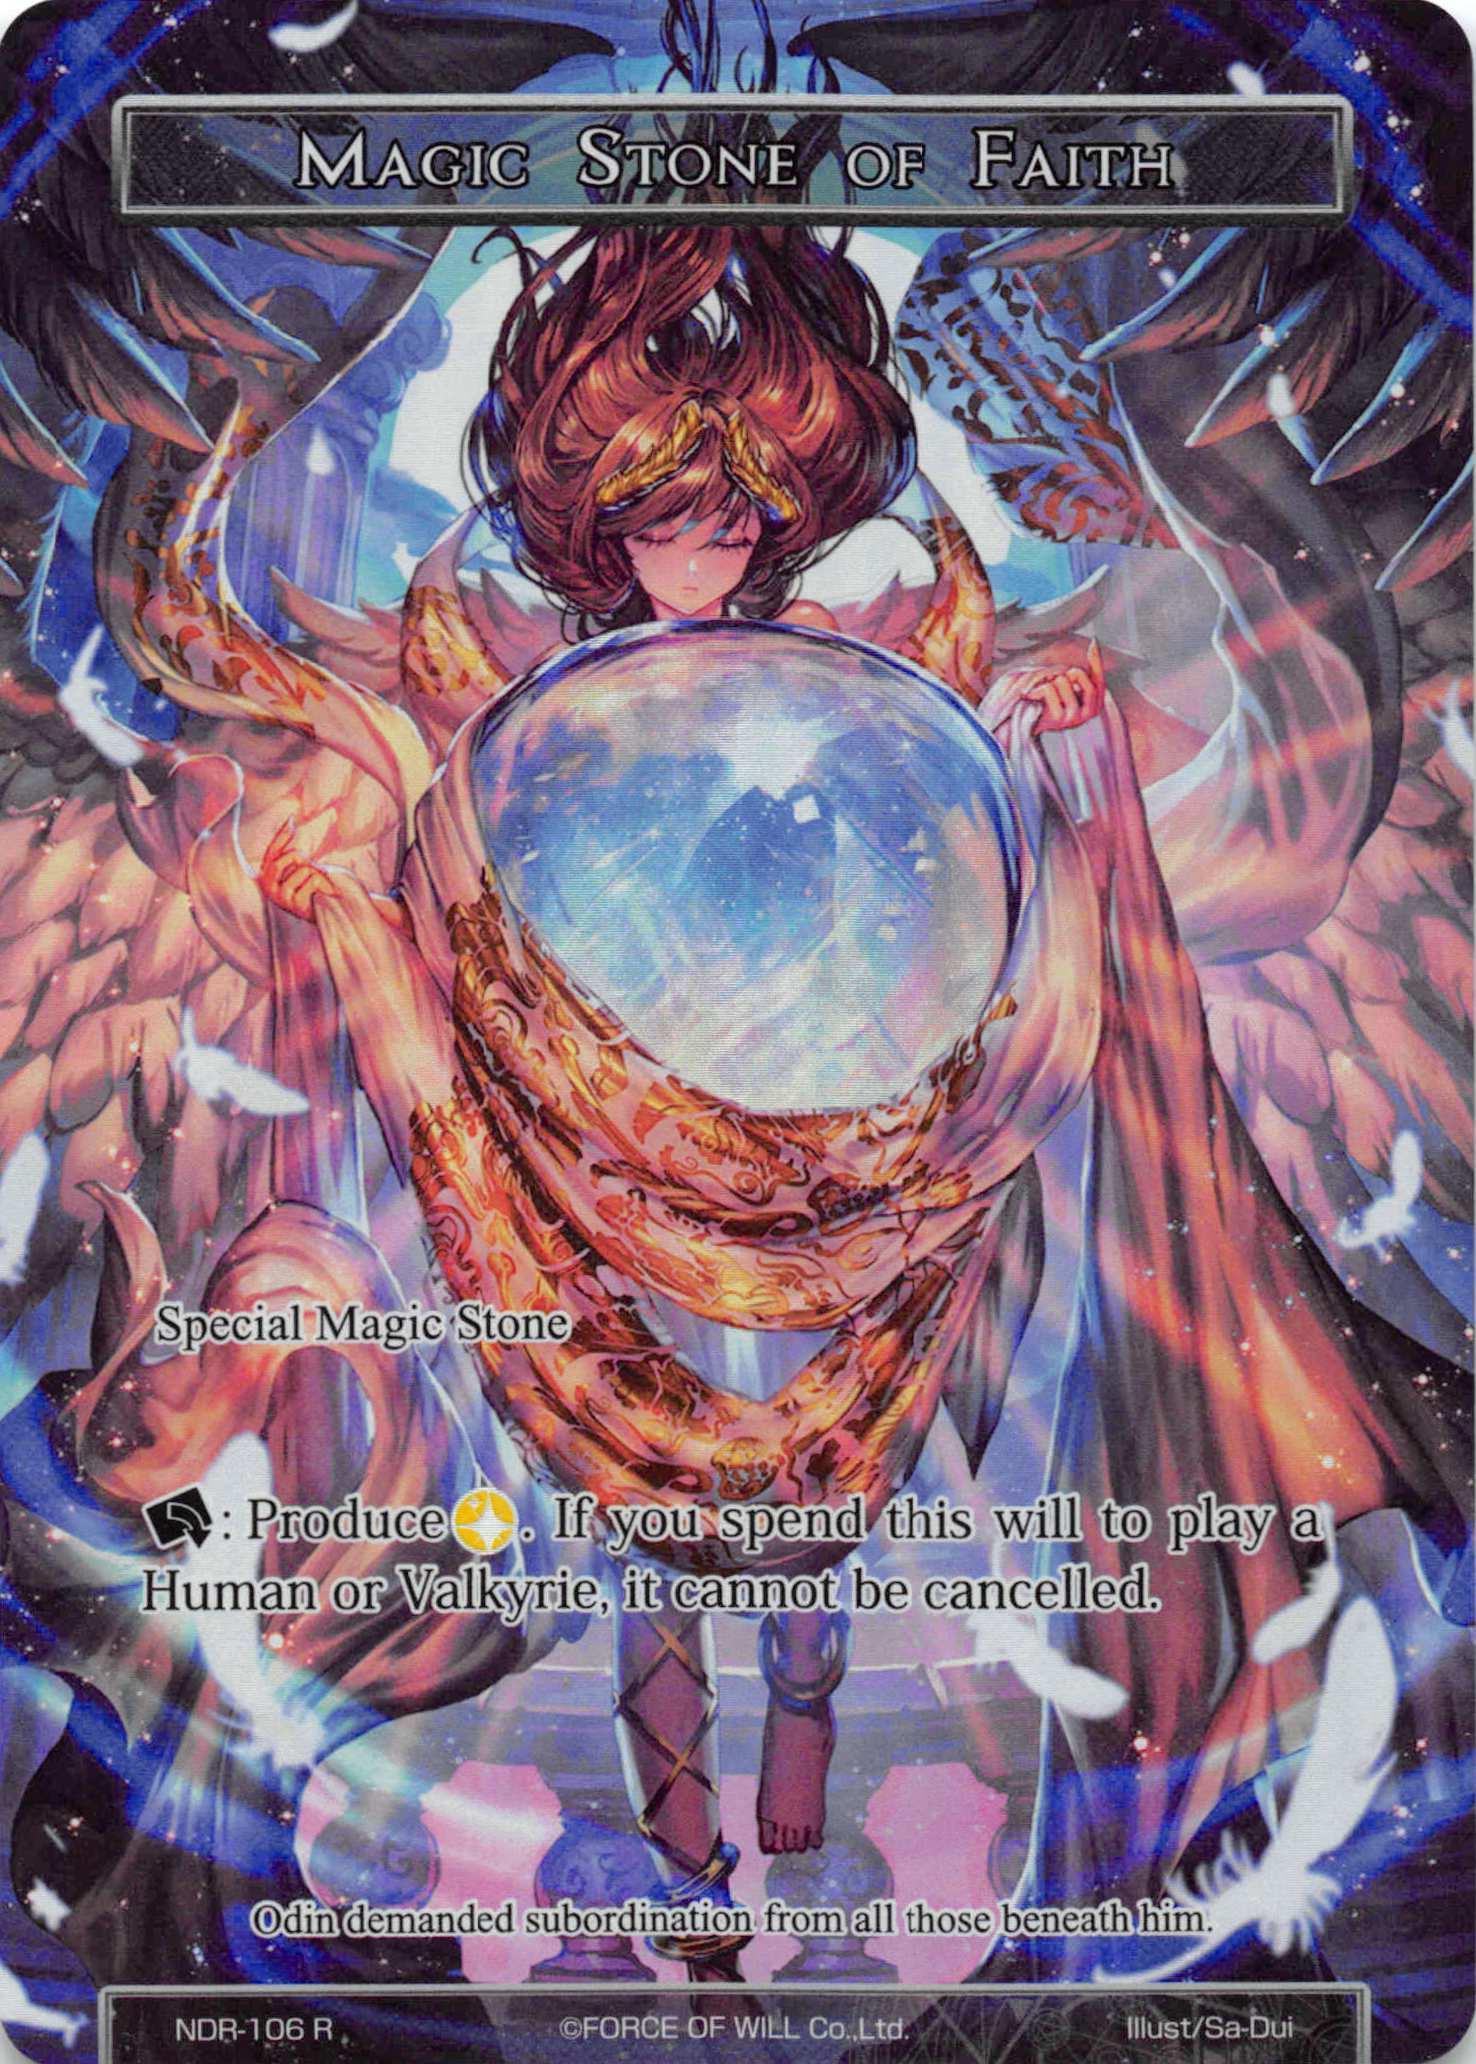 Magic Stone of Faith - NDR-106 - R - Full Art - Force of Will TCG Singles »  New Valhalla Cluster » New Dawn Rise - Carta Magica b3da9b3e42f1